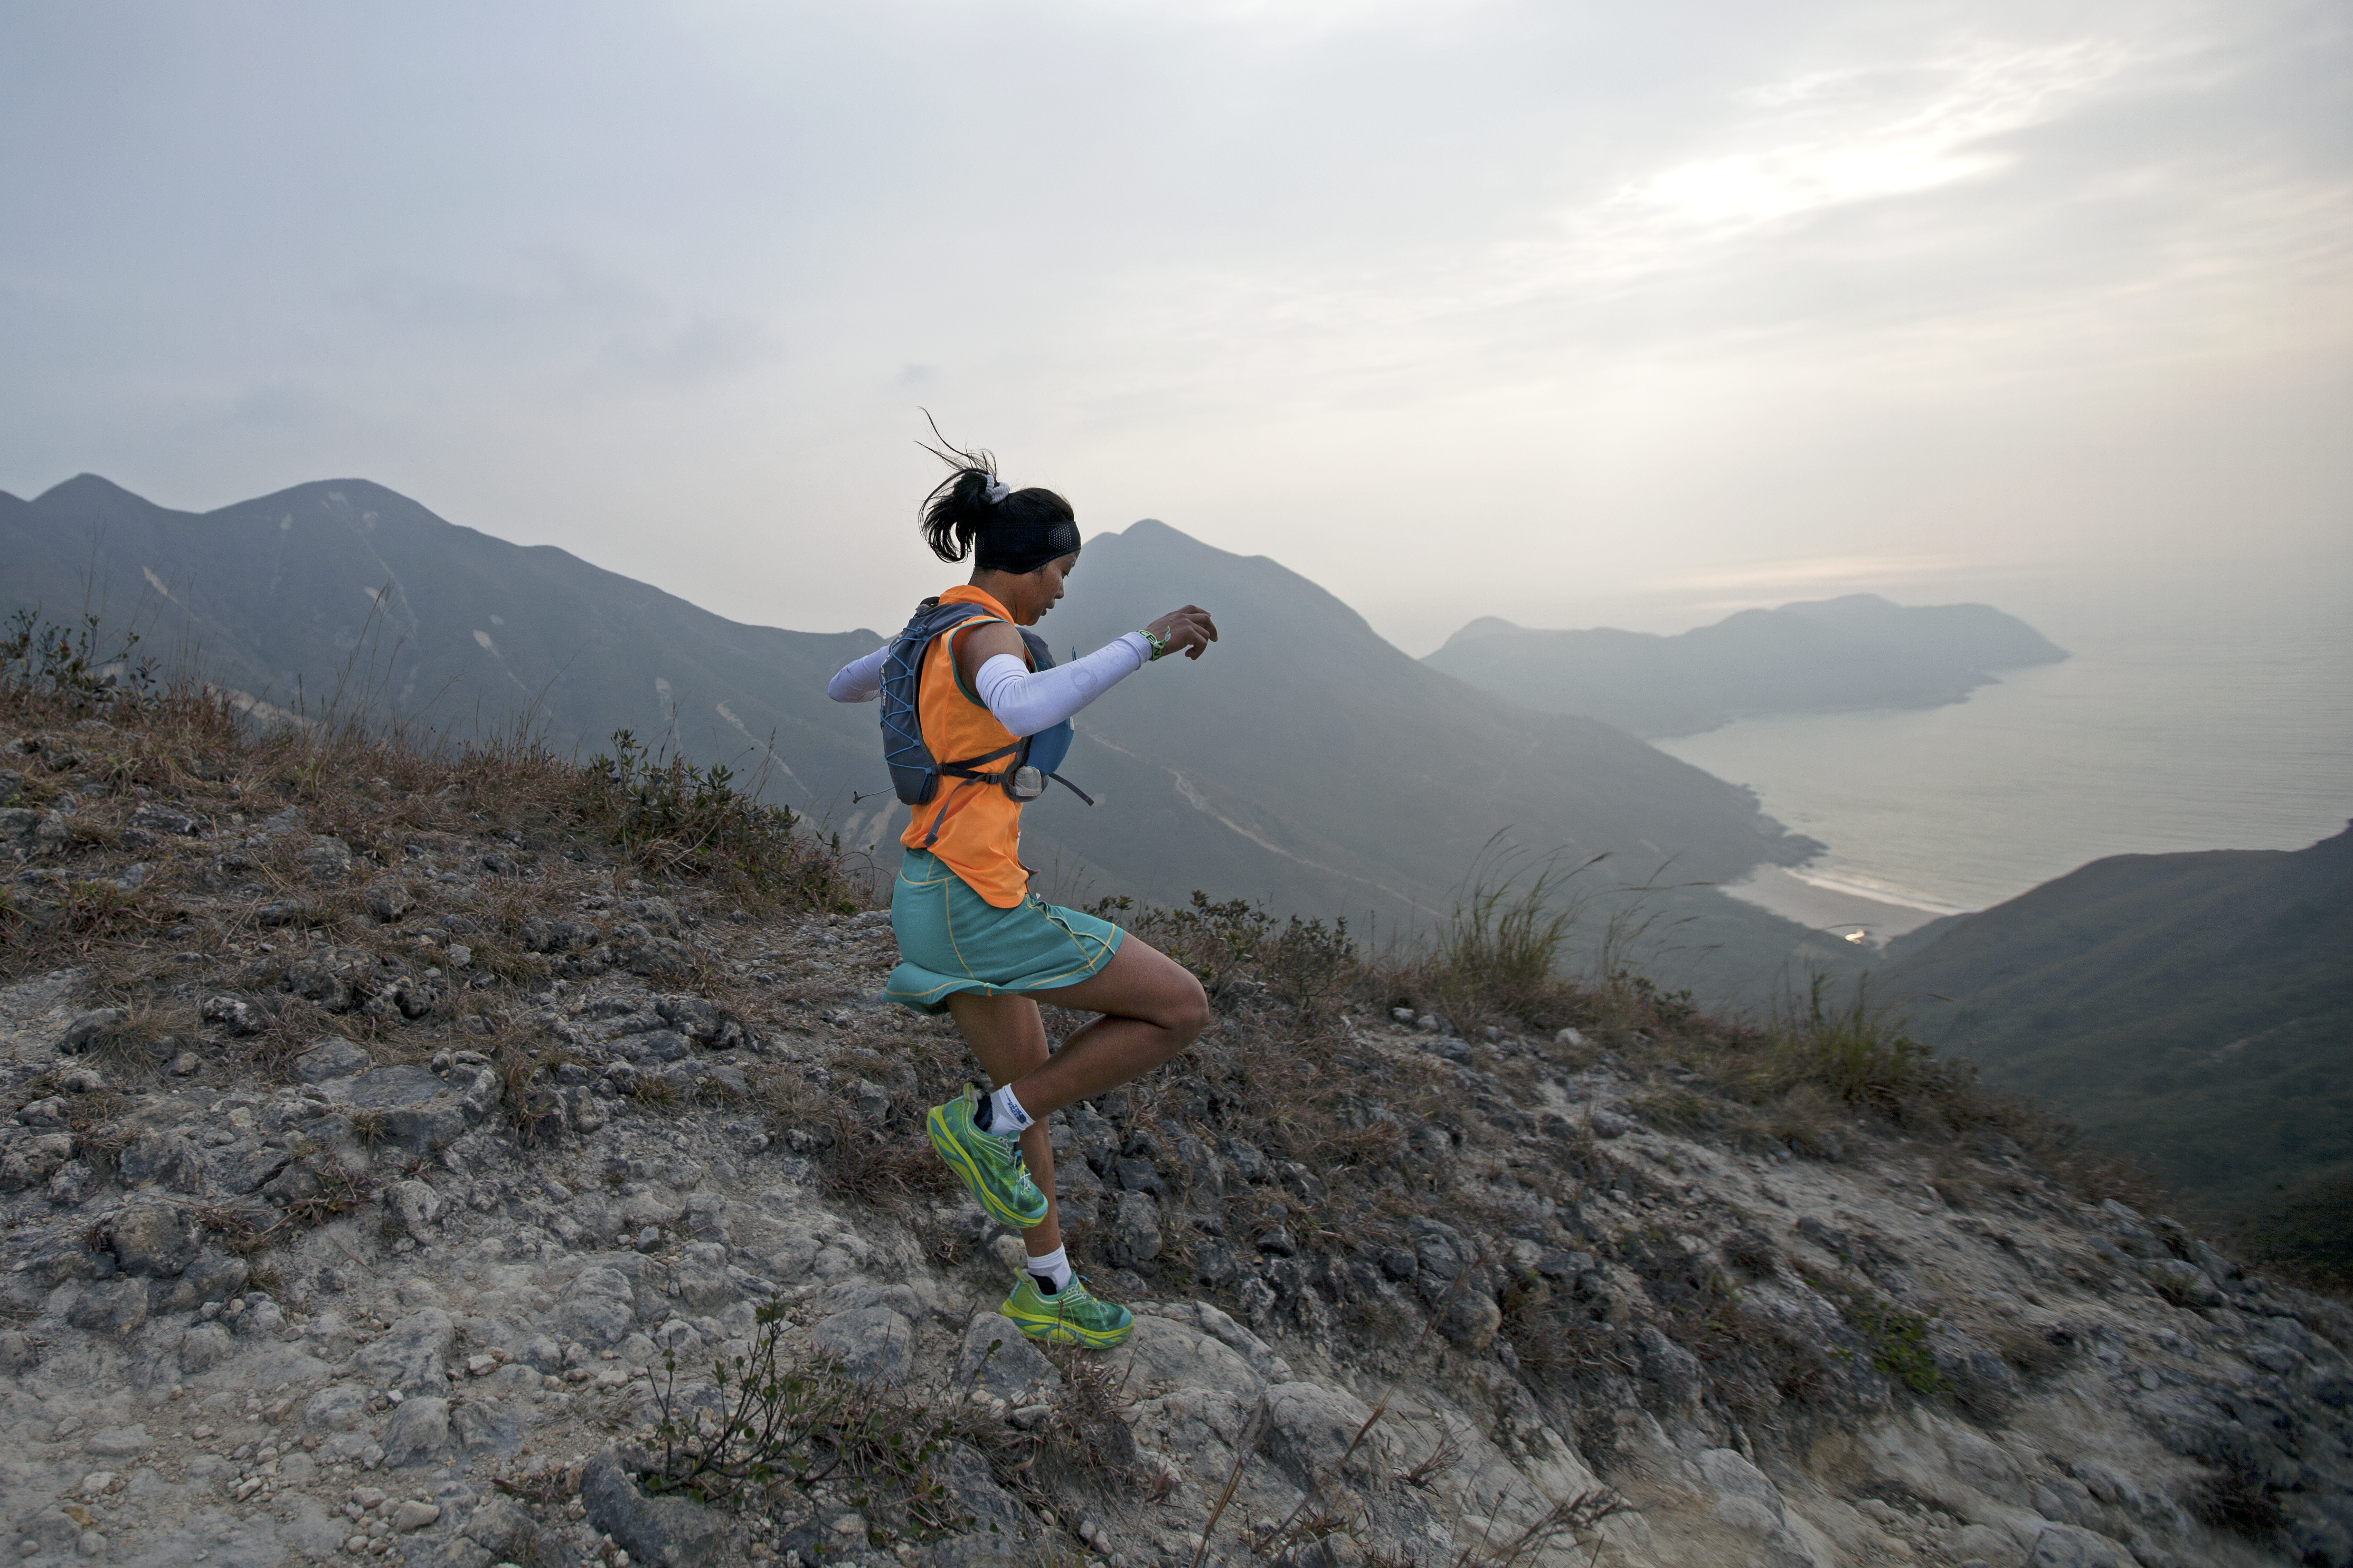 AAE Sai Kung Media Mira Rai IMG 5910 PS Photo Credit Lloyd Belcher - Championnats d'Asie de skyrunning: vers de nouveaux horizons